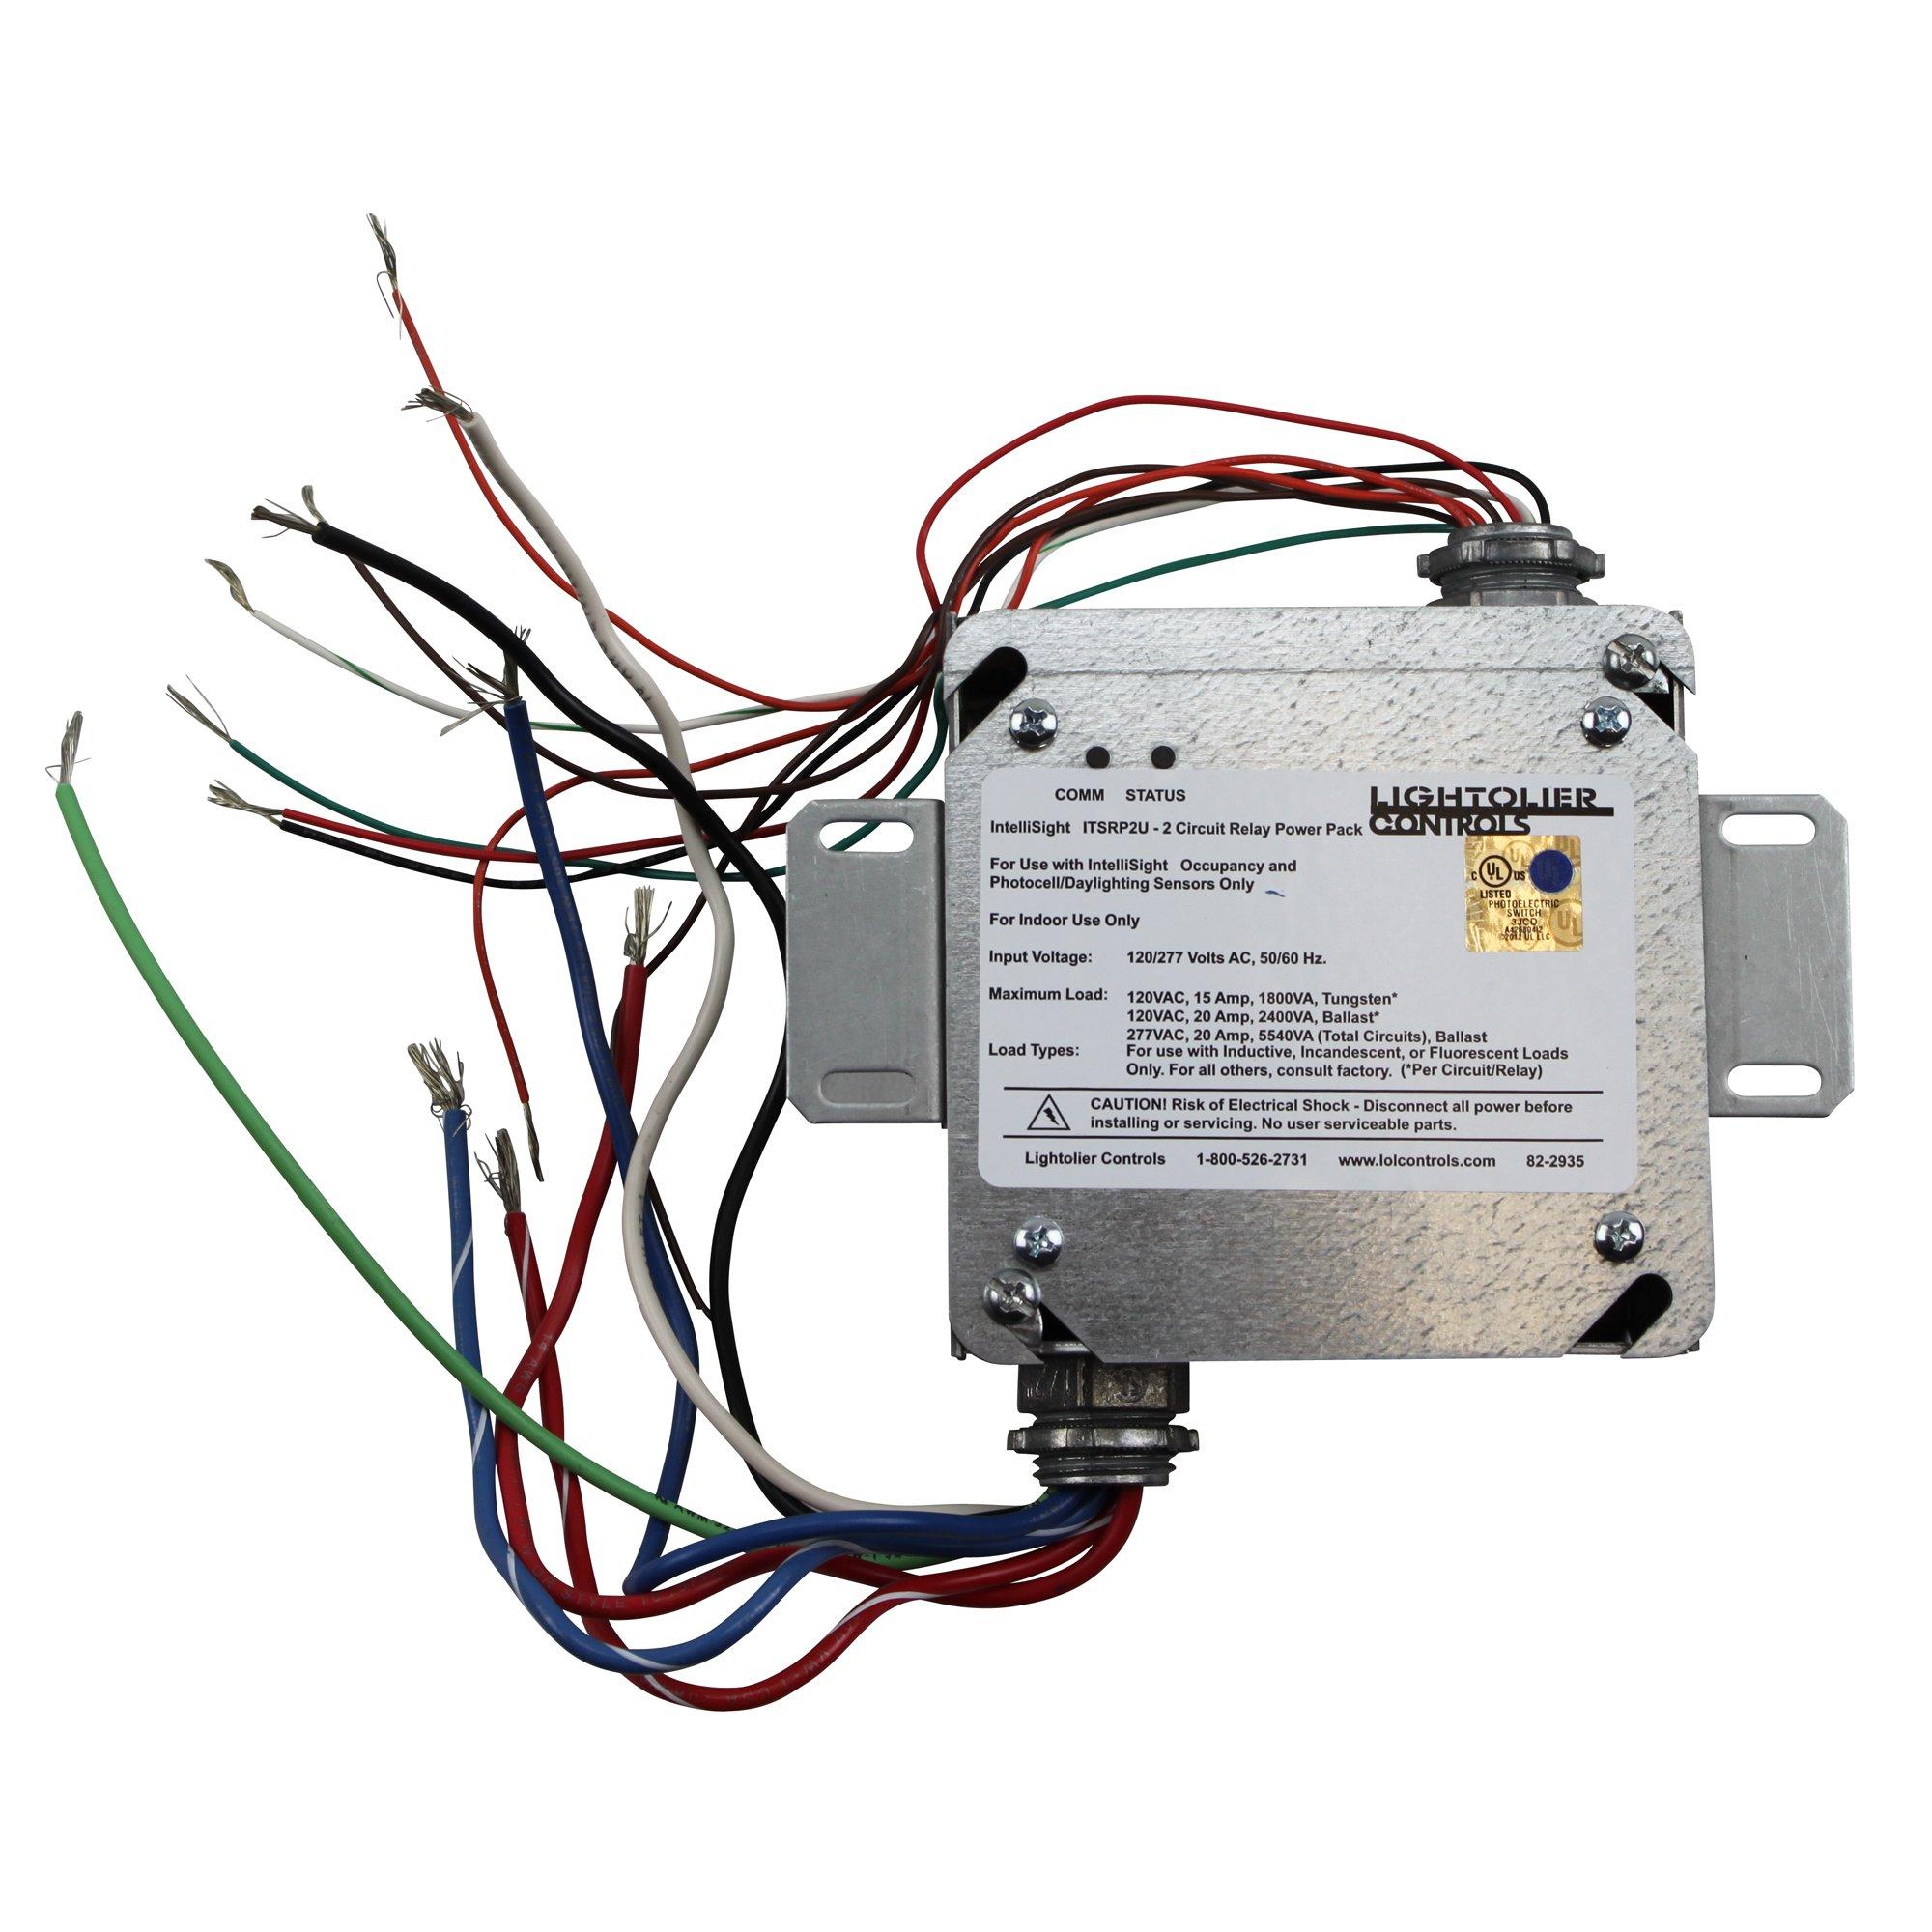 LIGHTOLIER ITSRP2U 120/277 INTELLISIGHT 2 CIRCUIT RELAY POWER PACK